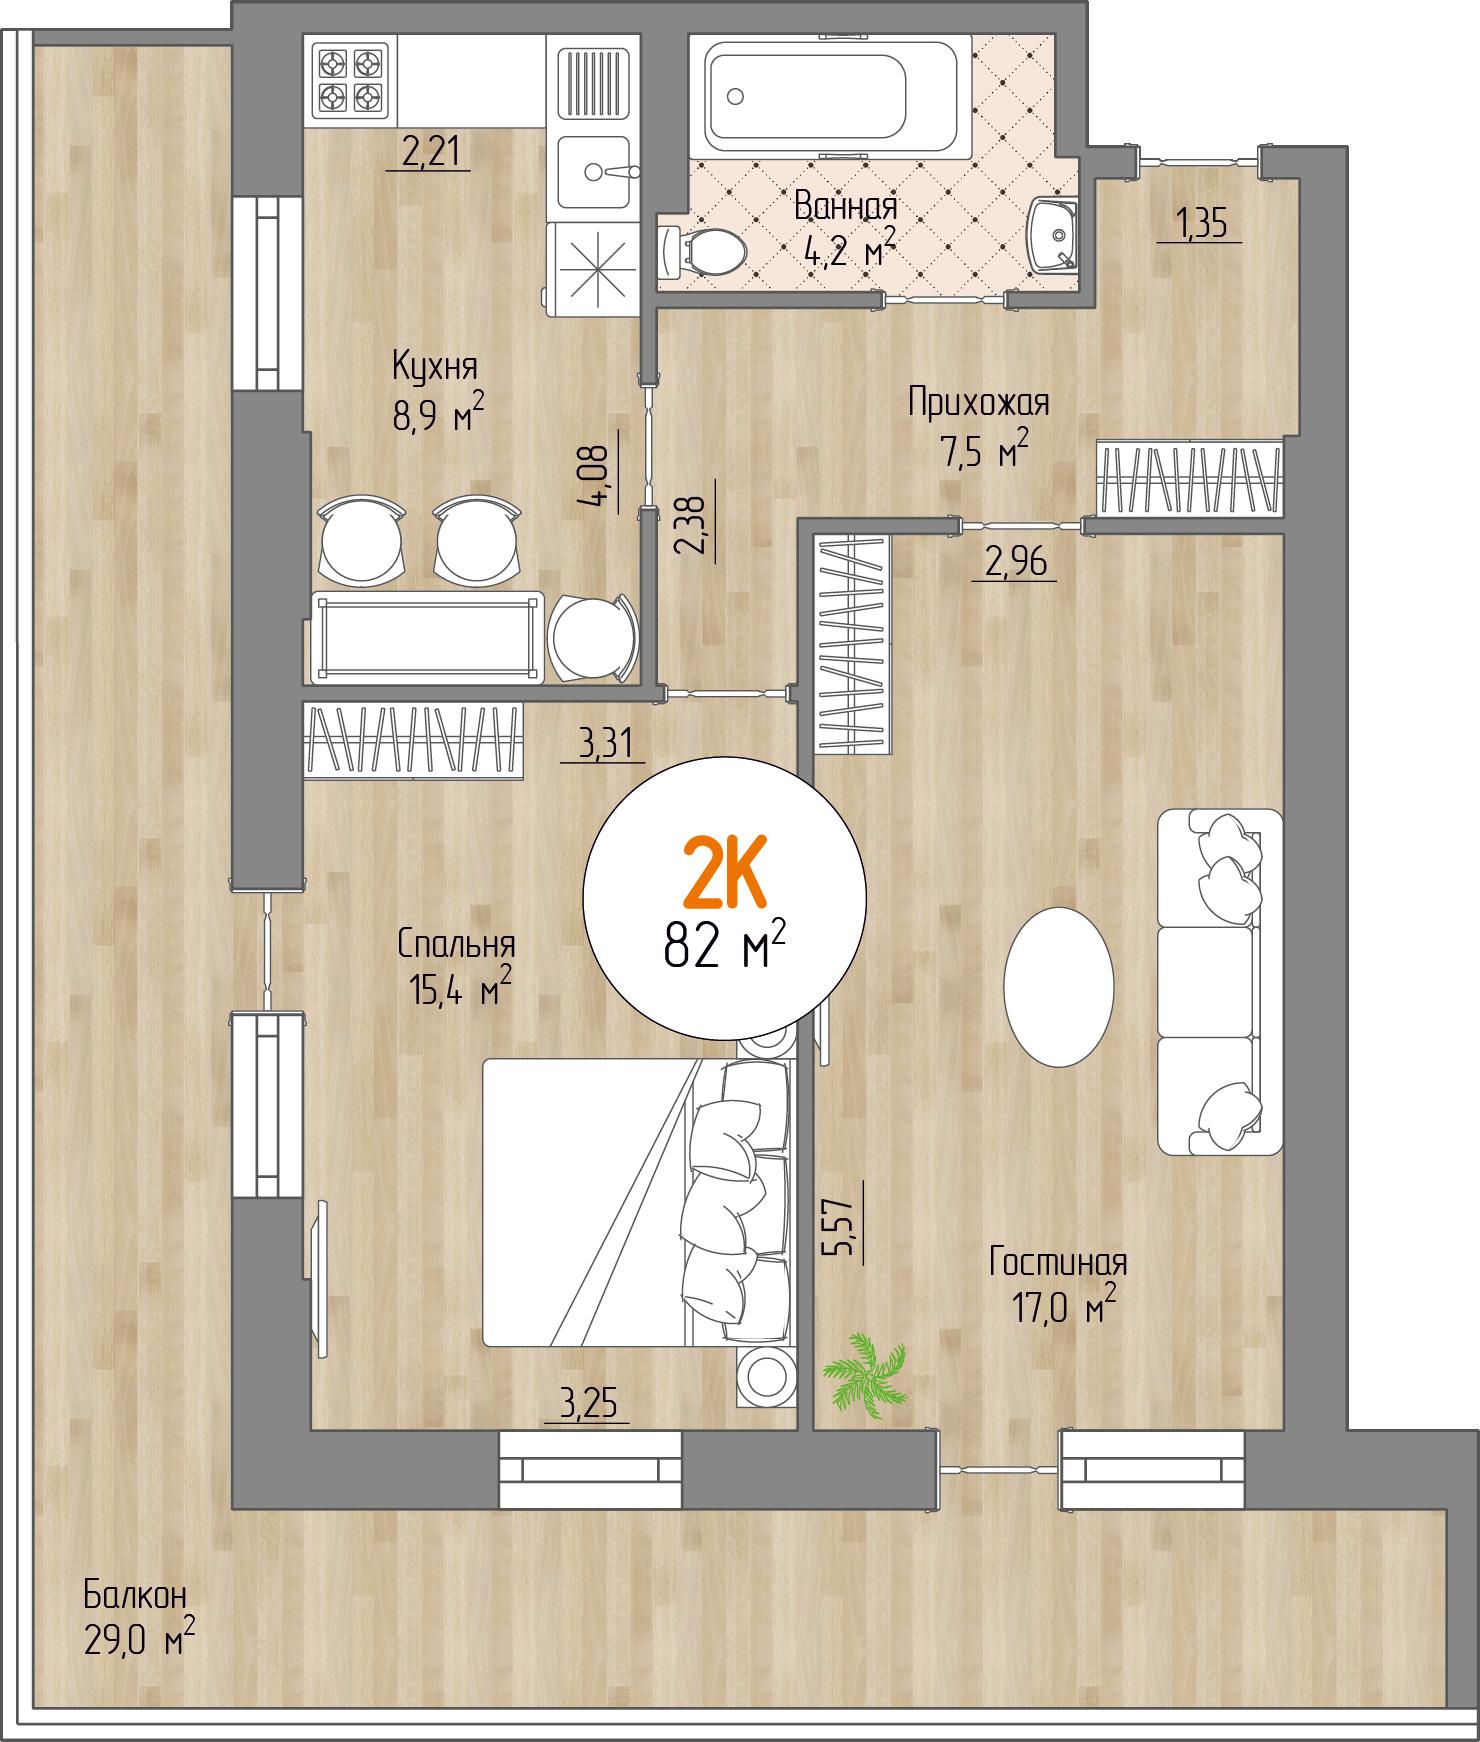 Отрисовки планов квартир в новом стиле